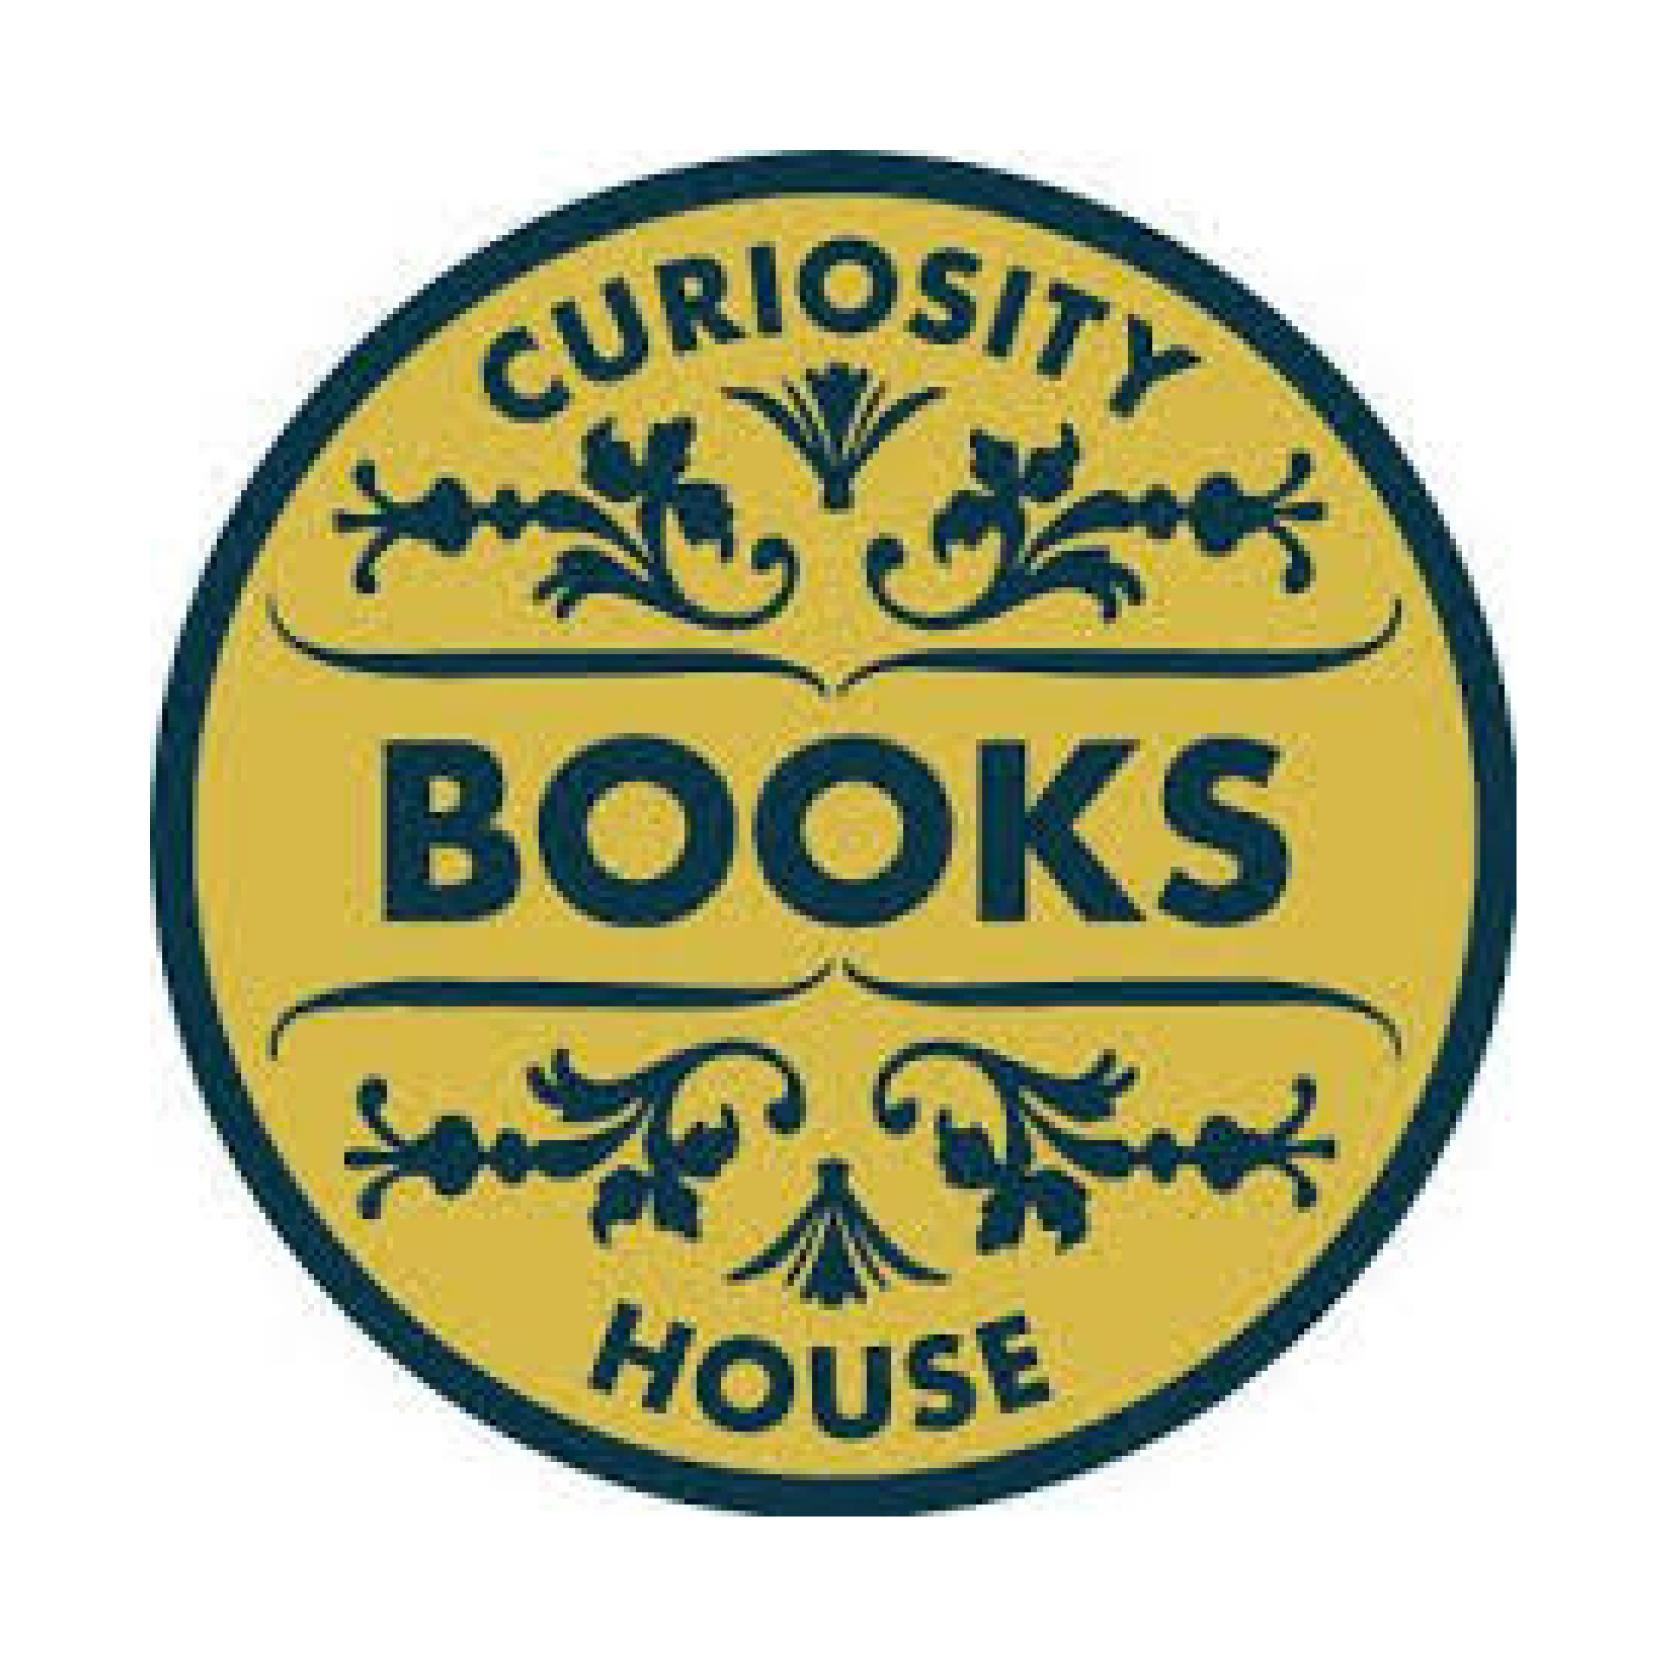 https://www.curiosityhousebooks.com/